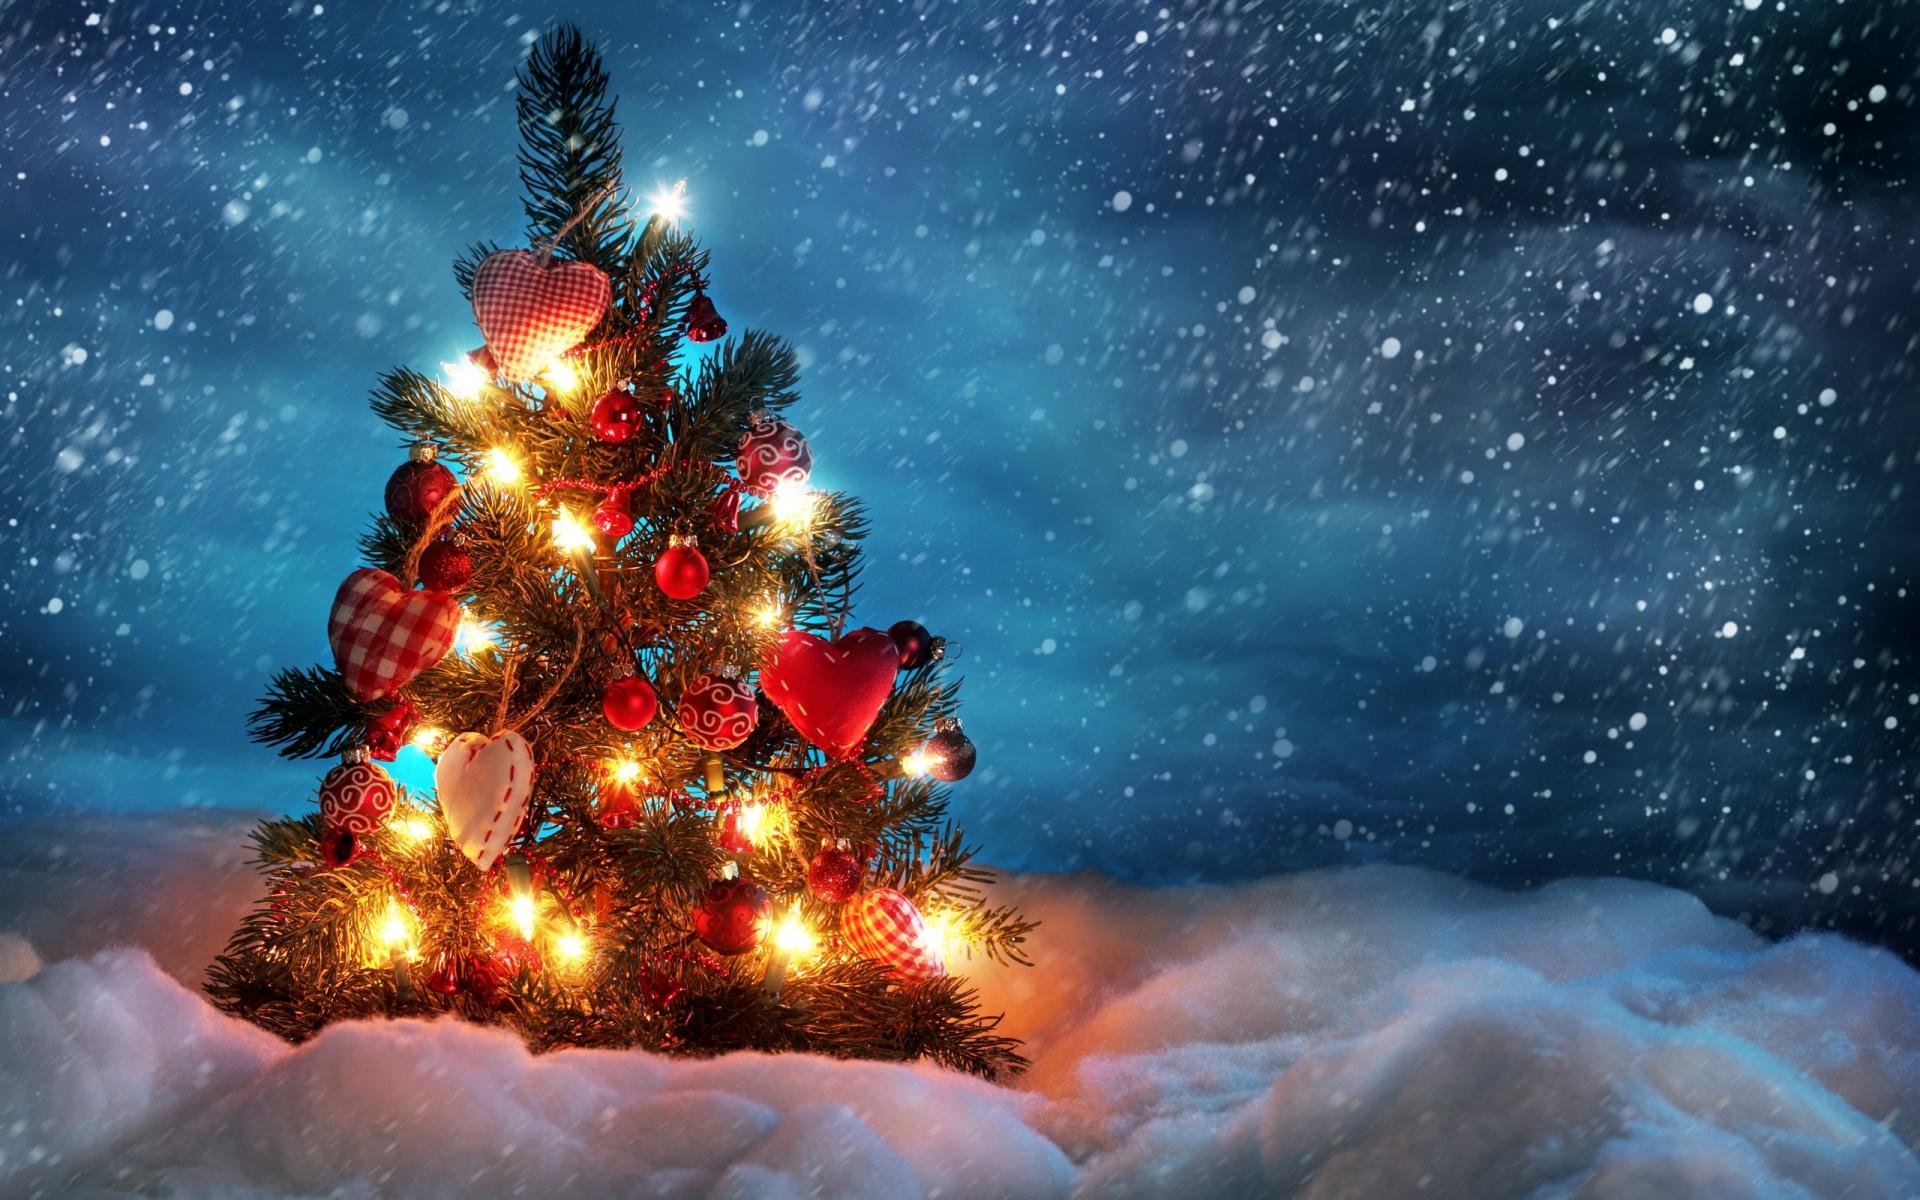 Cute Christmas Tree computer desktop wallpaper 1920x1200